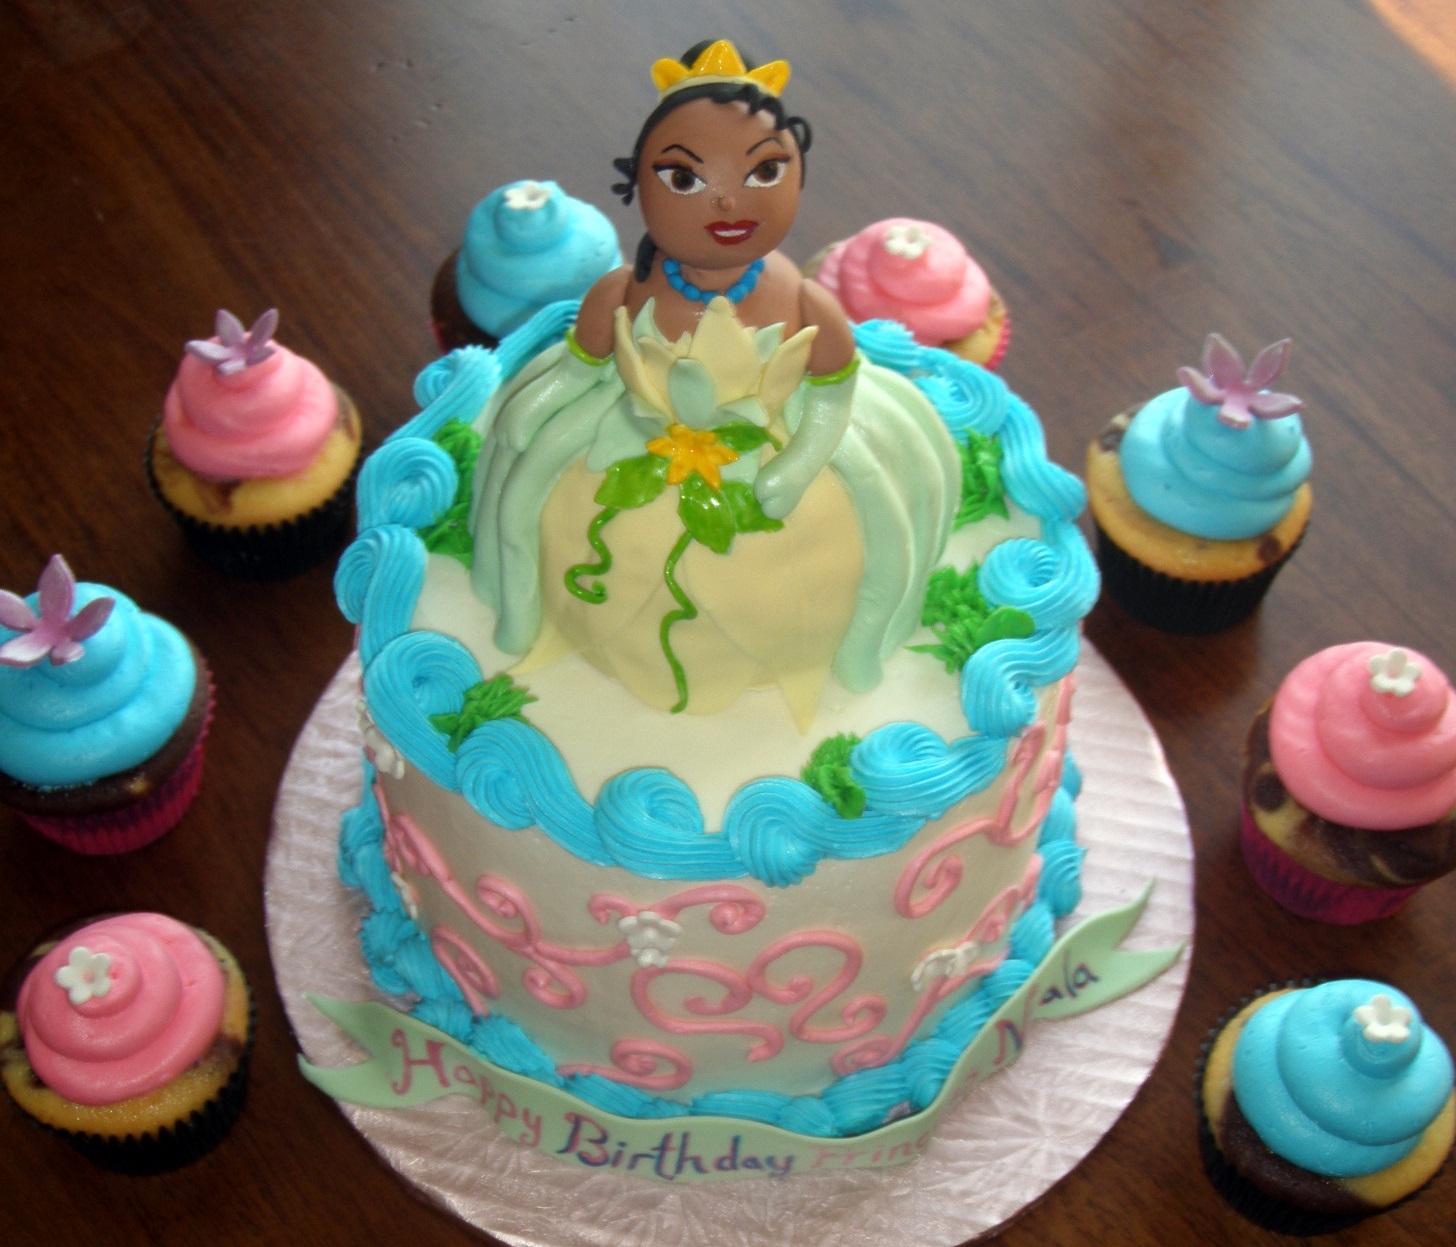 Groovy Princess And The Frog Birthday Cake And Cupcake Ideas Funny Birthday Cards Online Elaedamsfinfo